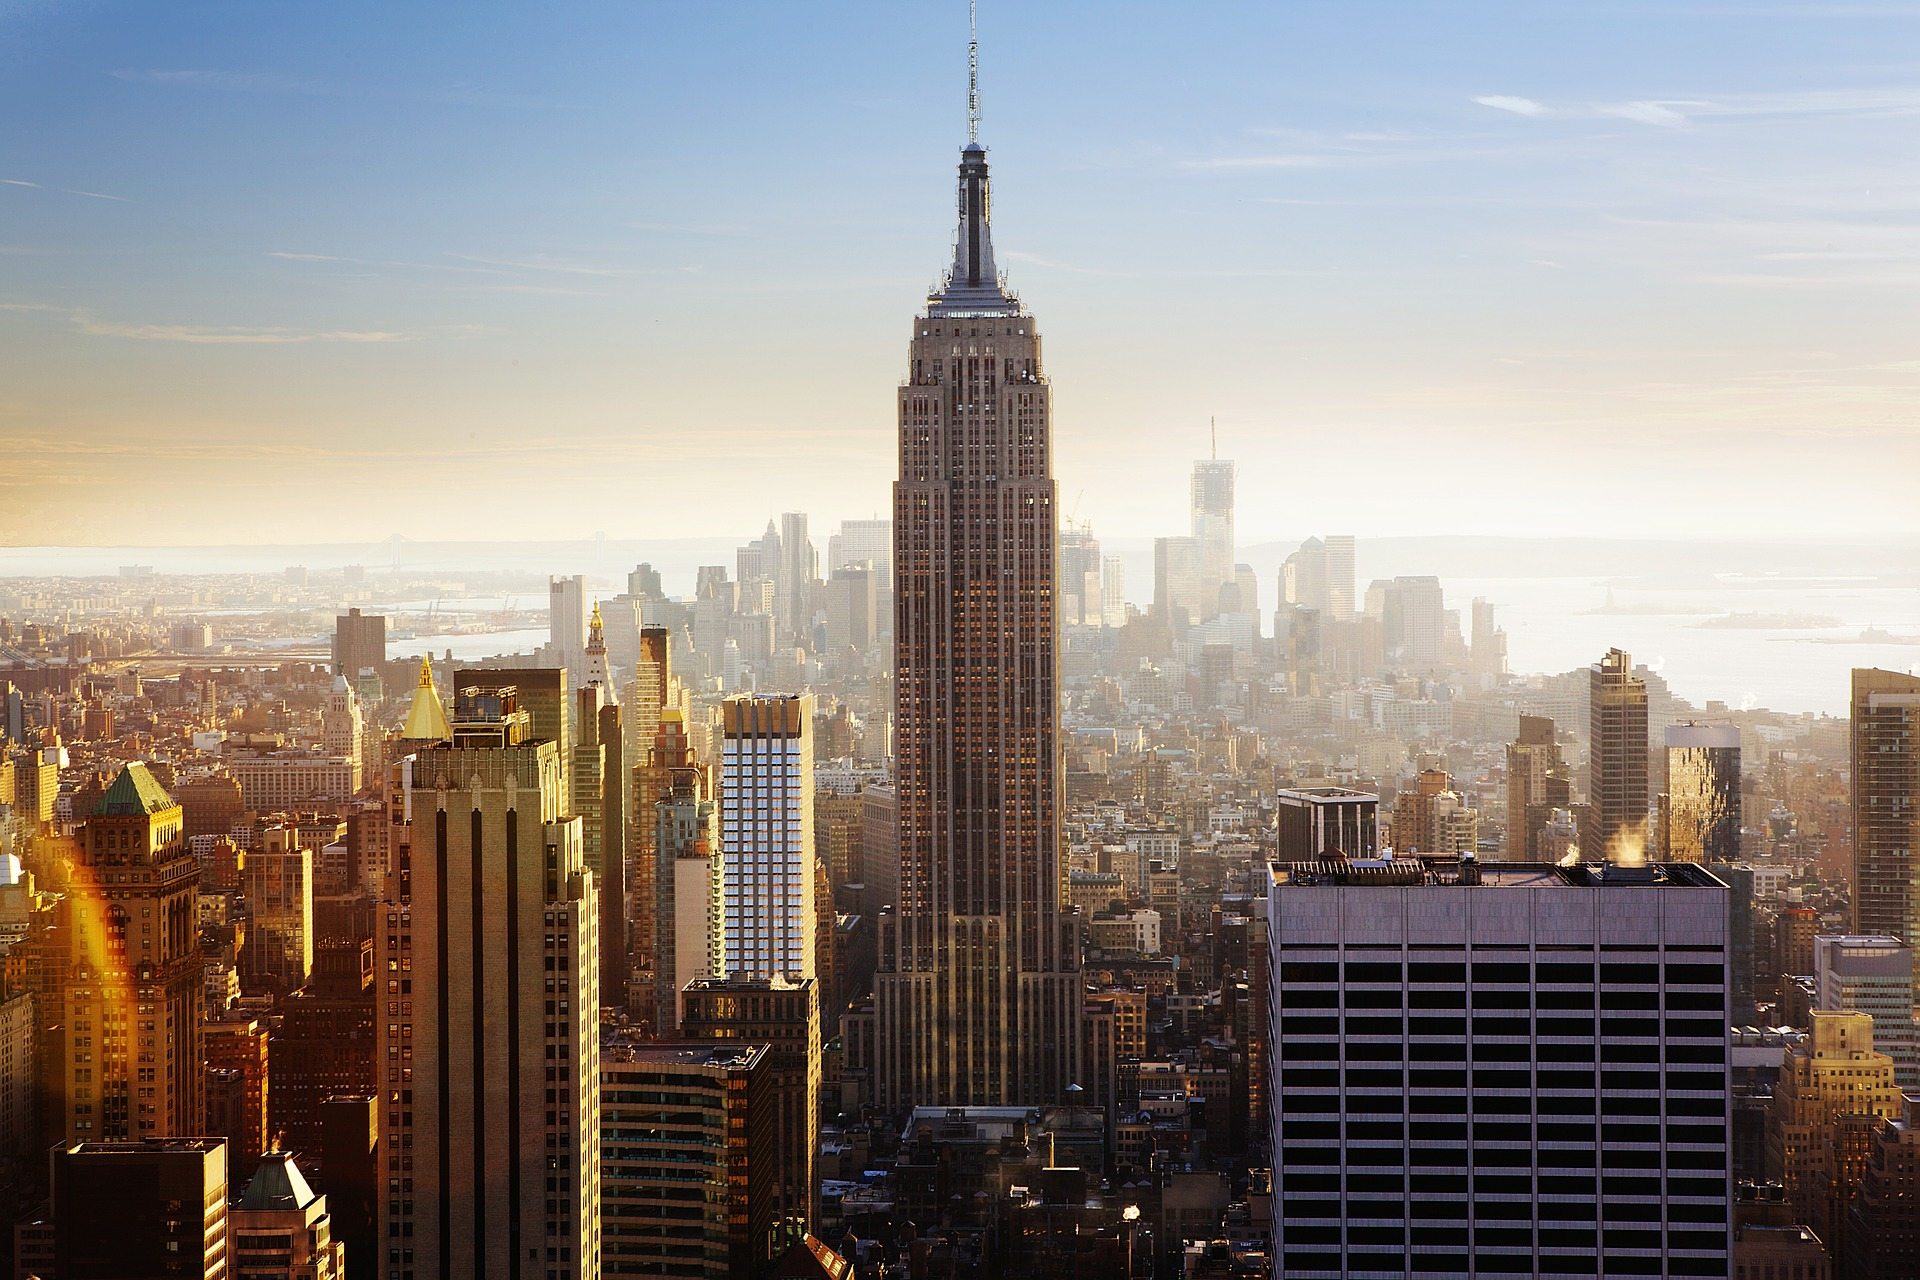 Empire State © Unsplash/Pixabay